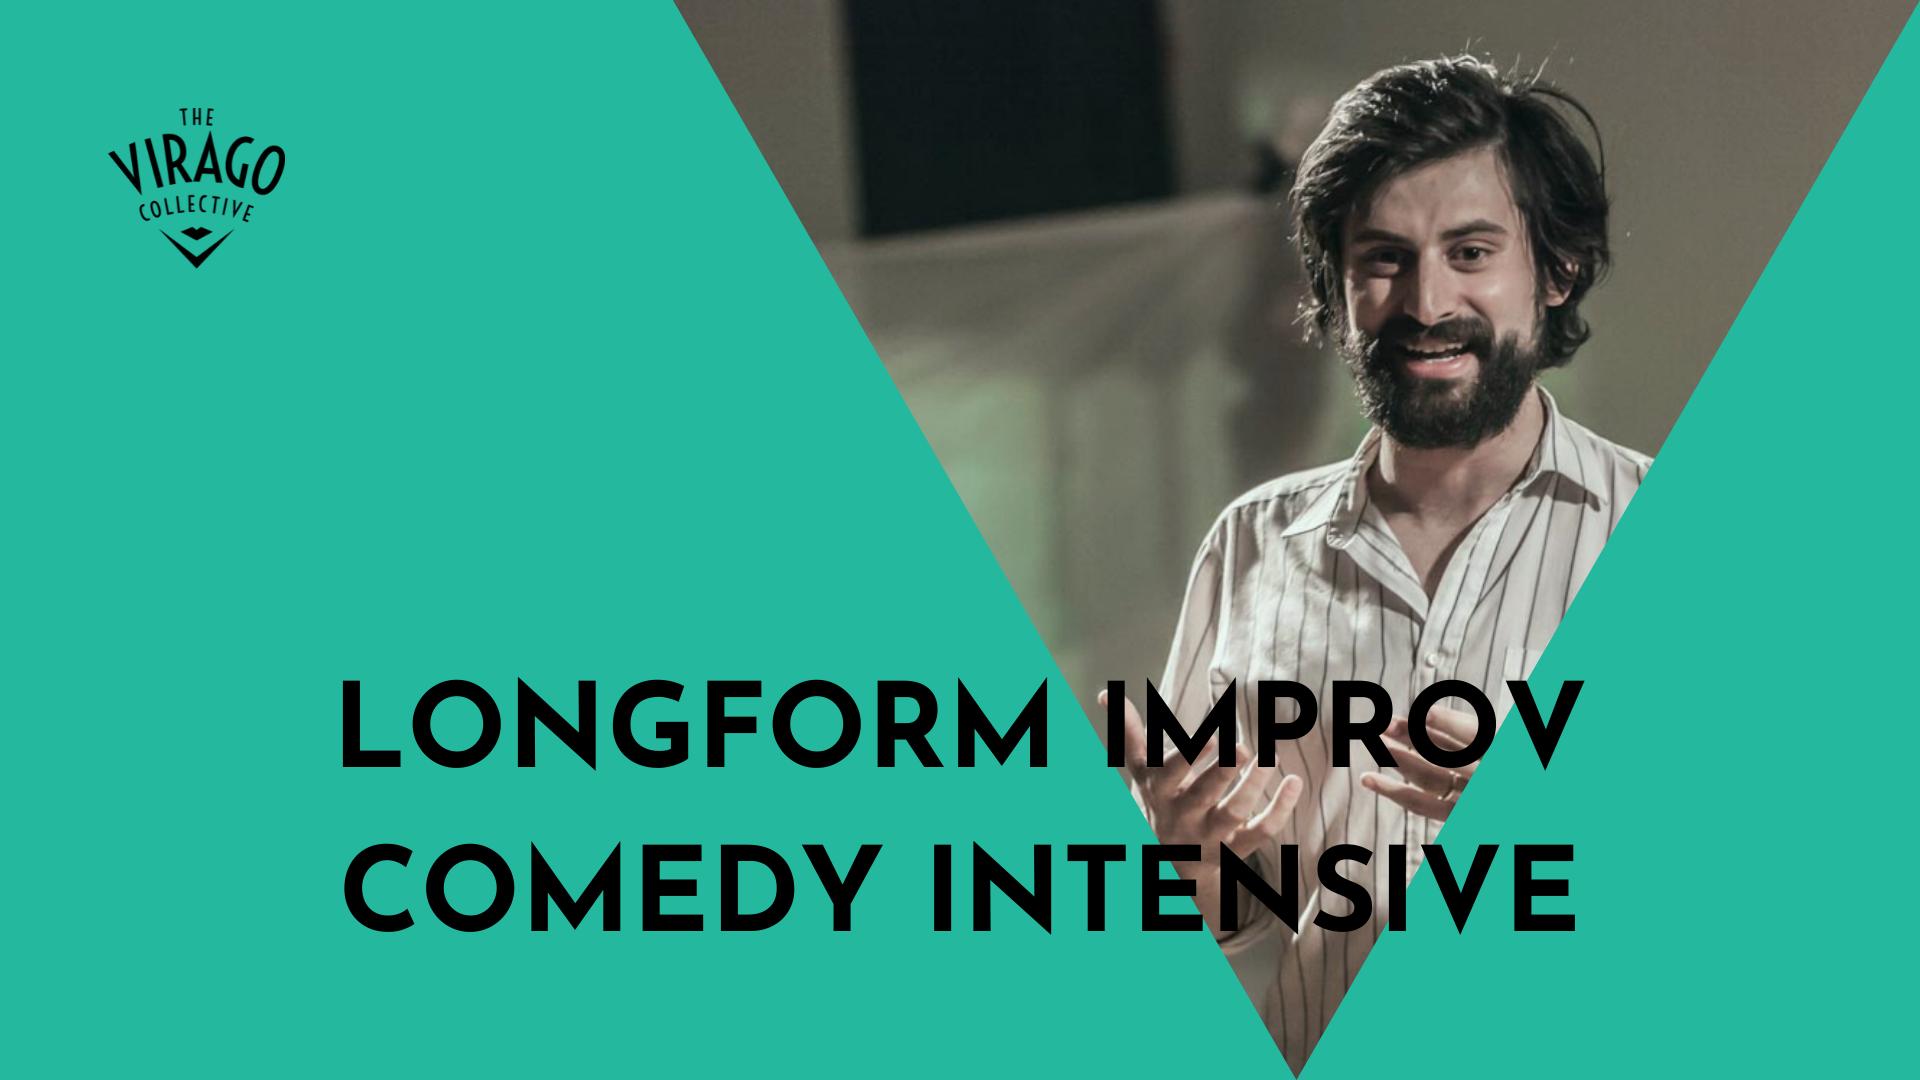 Longform Improv Comedy Intensive